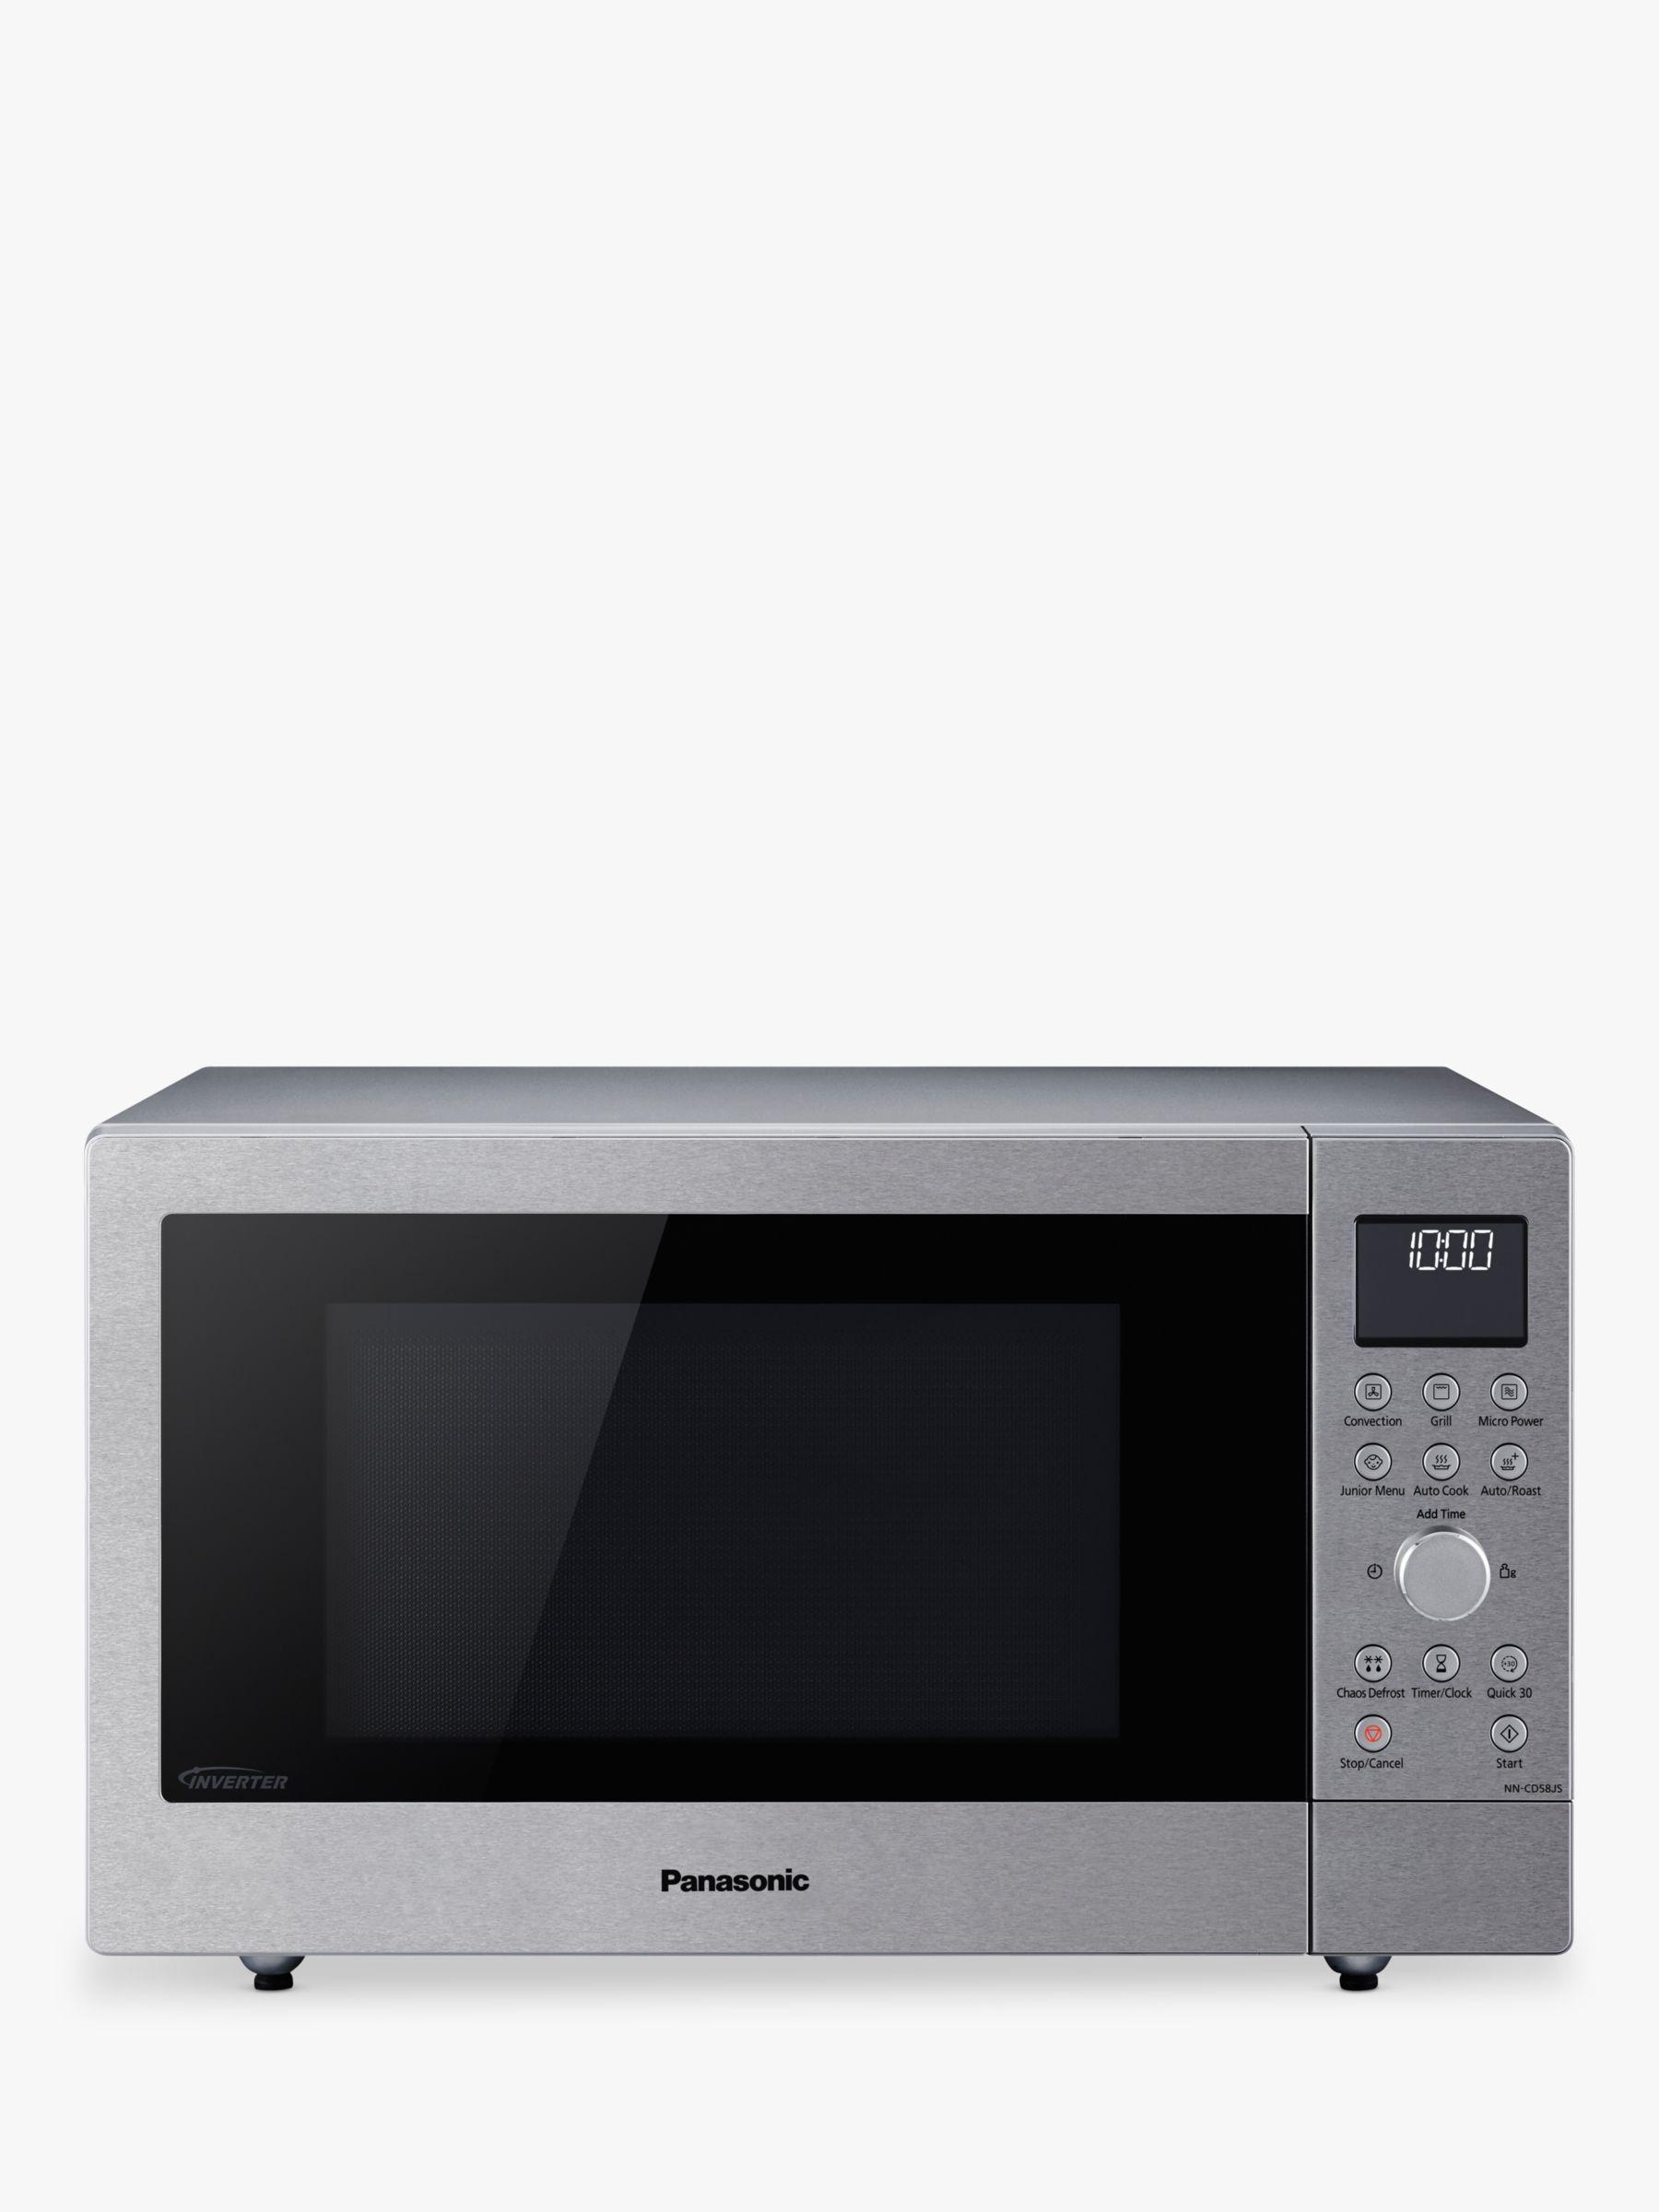 Panasonic Nn Cd58jsbpq 27l Slimline Combination Microwave Oven Stainless Steel At John Lewis Partners